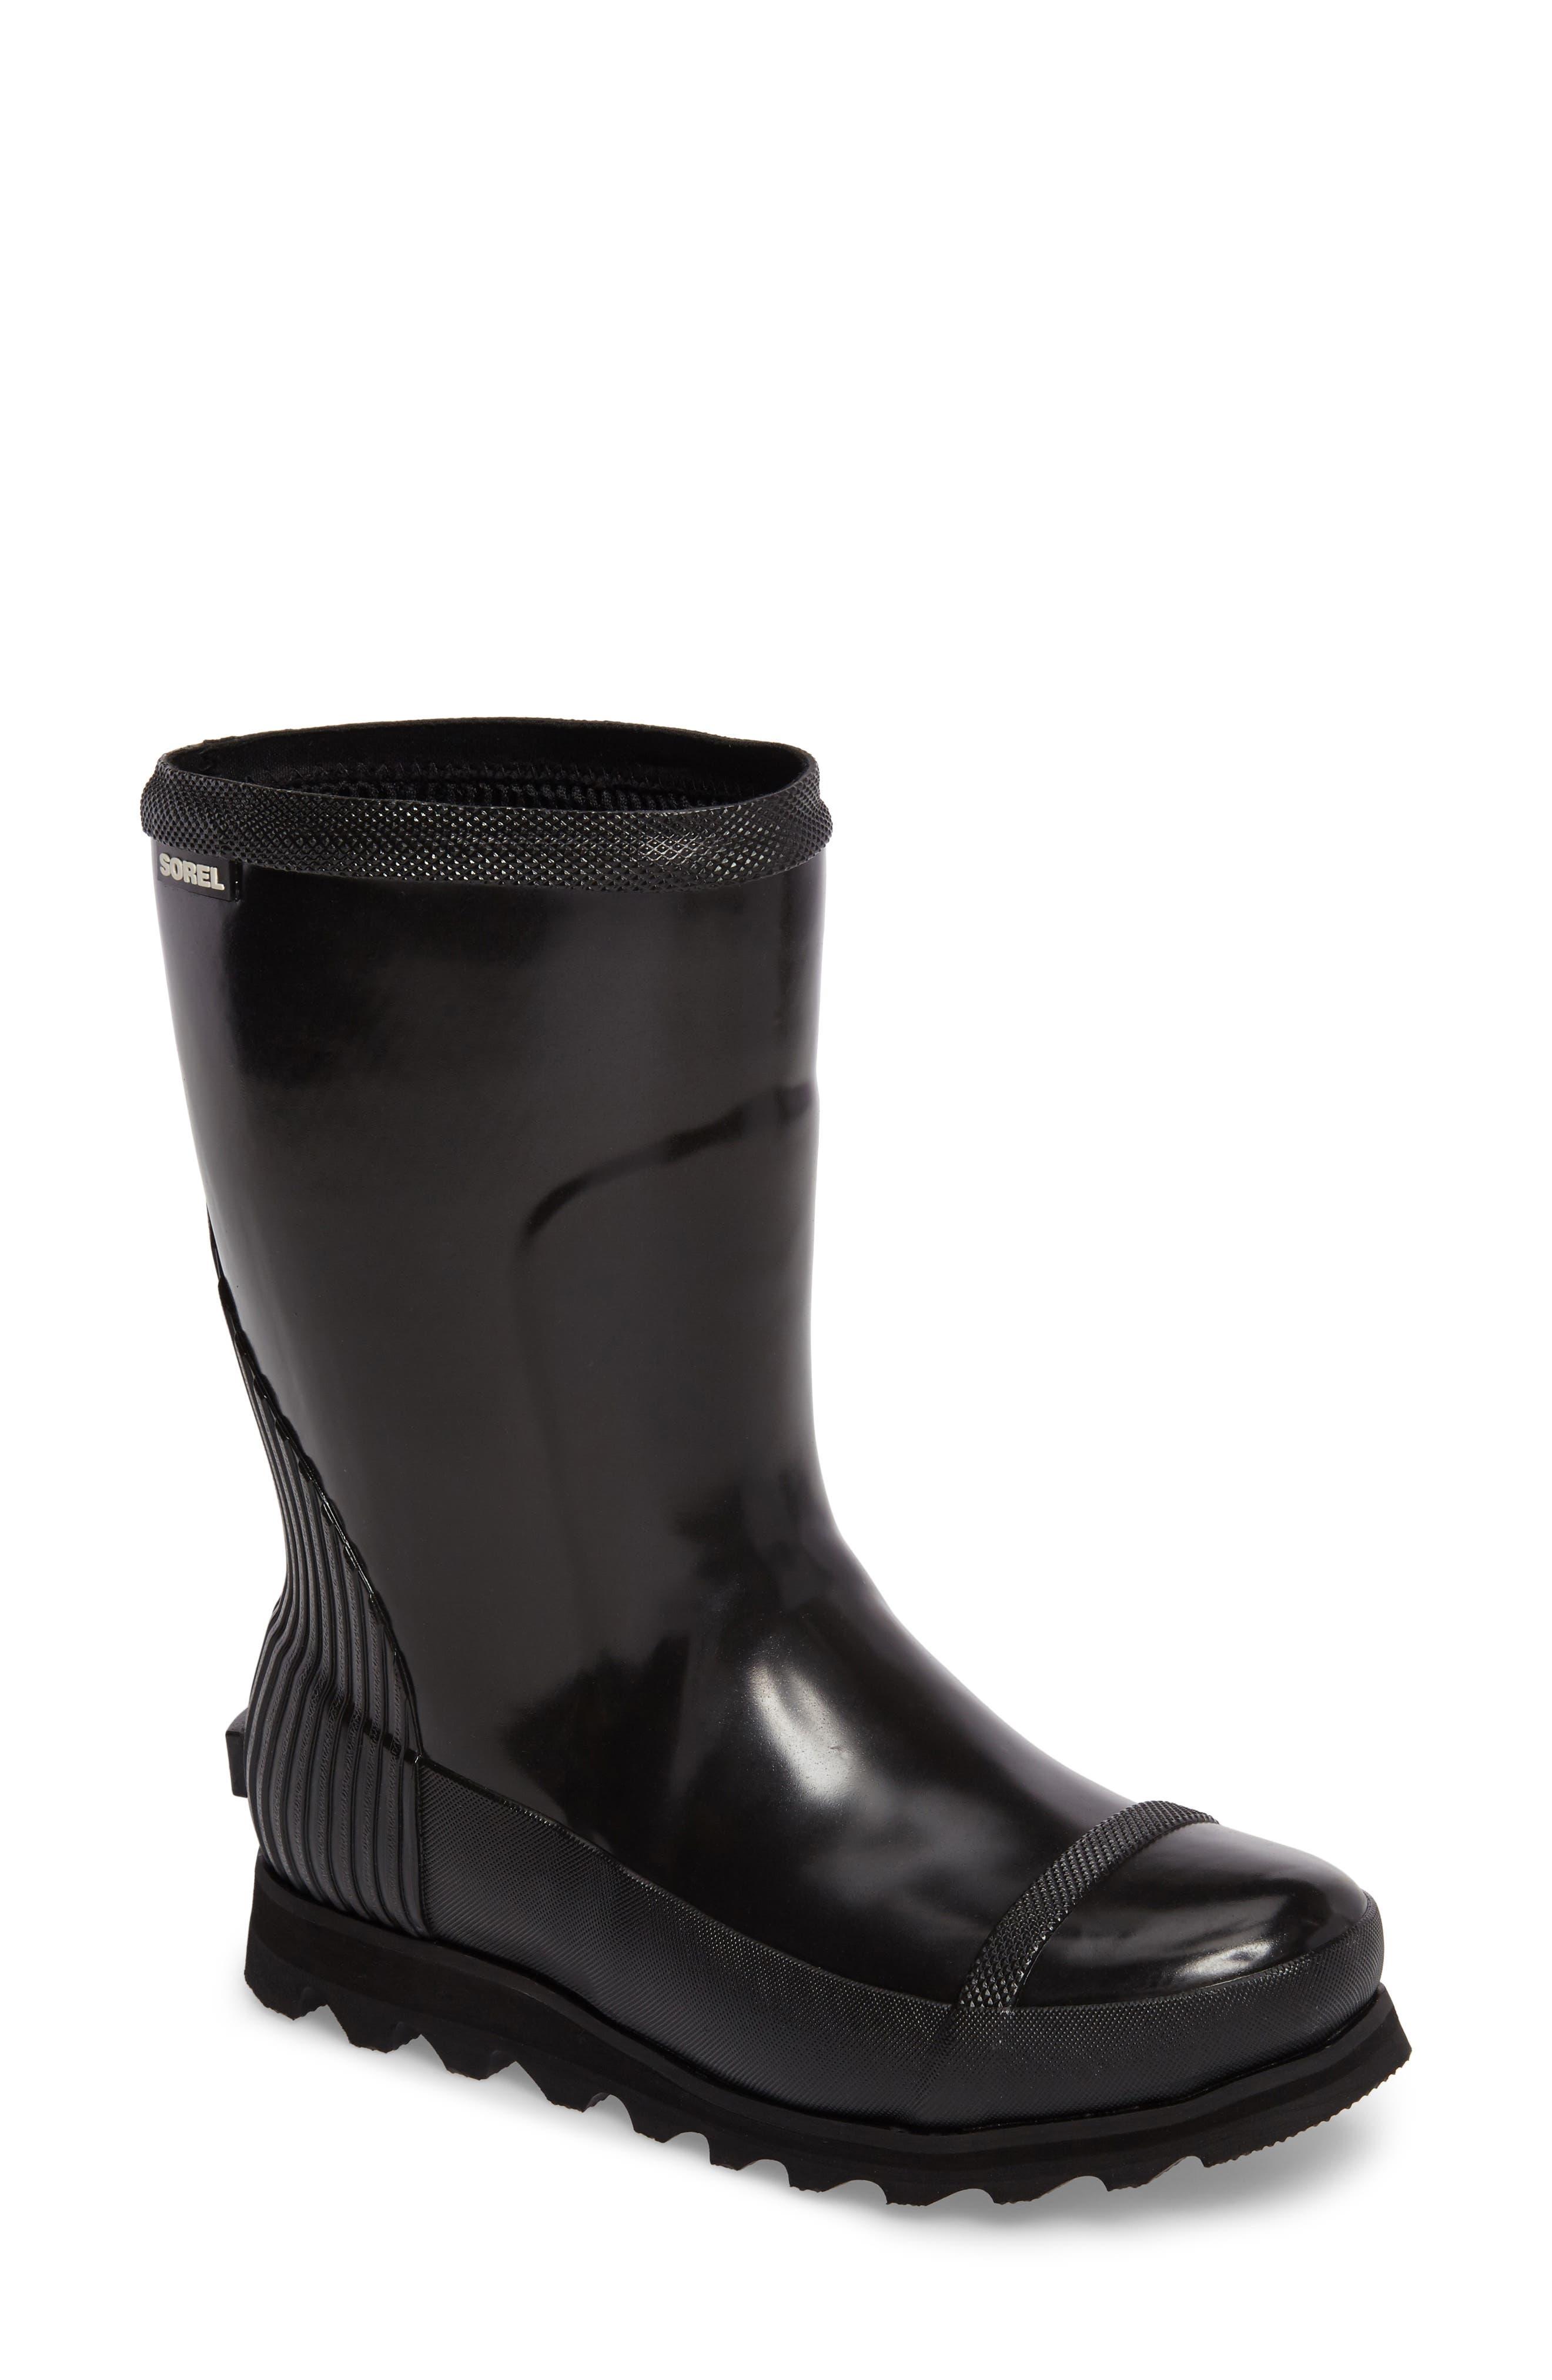 Joan Glossy Short Rain Boot,                             Main thumbnail 1, color,                             Black/ Sea Salt